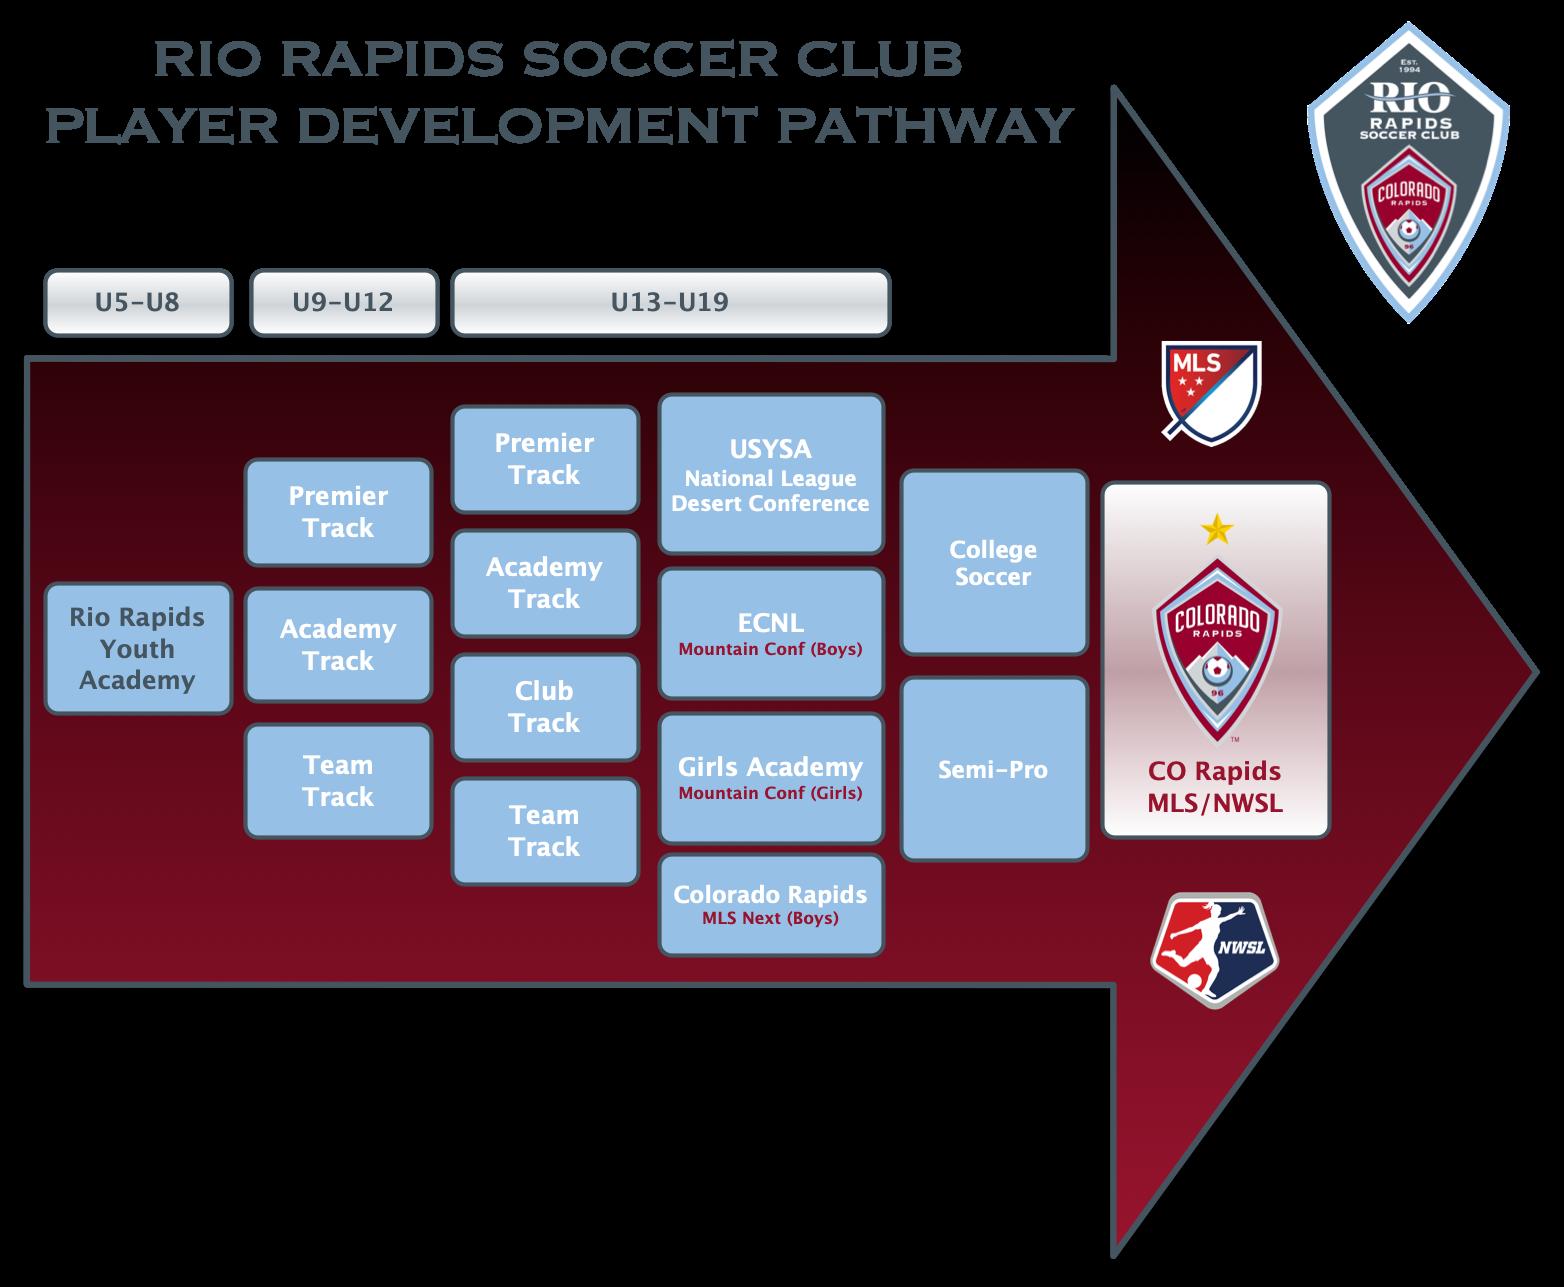 Rrsc programs pathway 042821